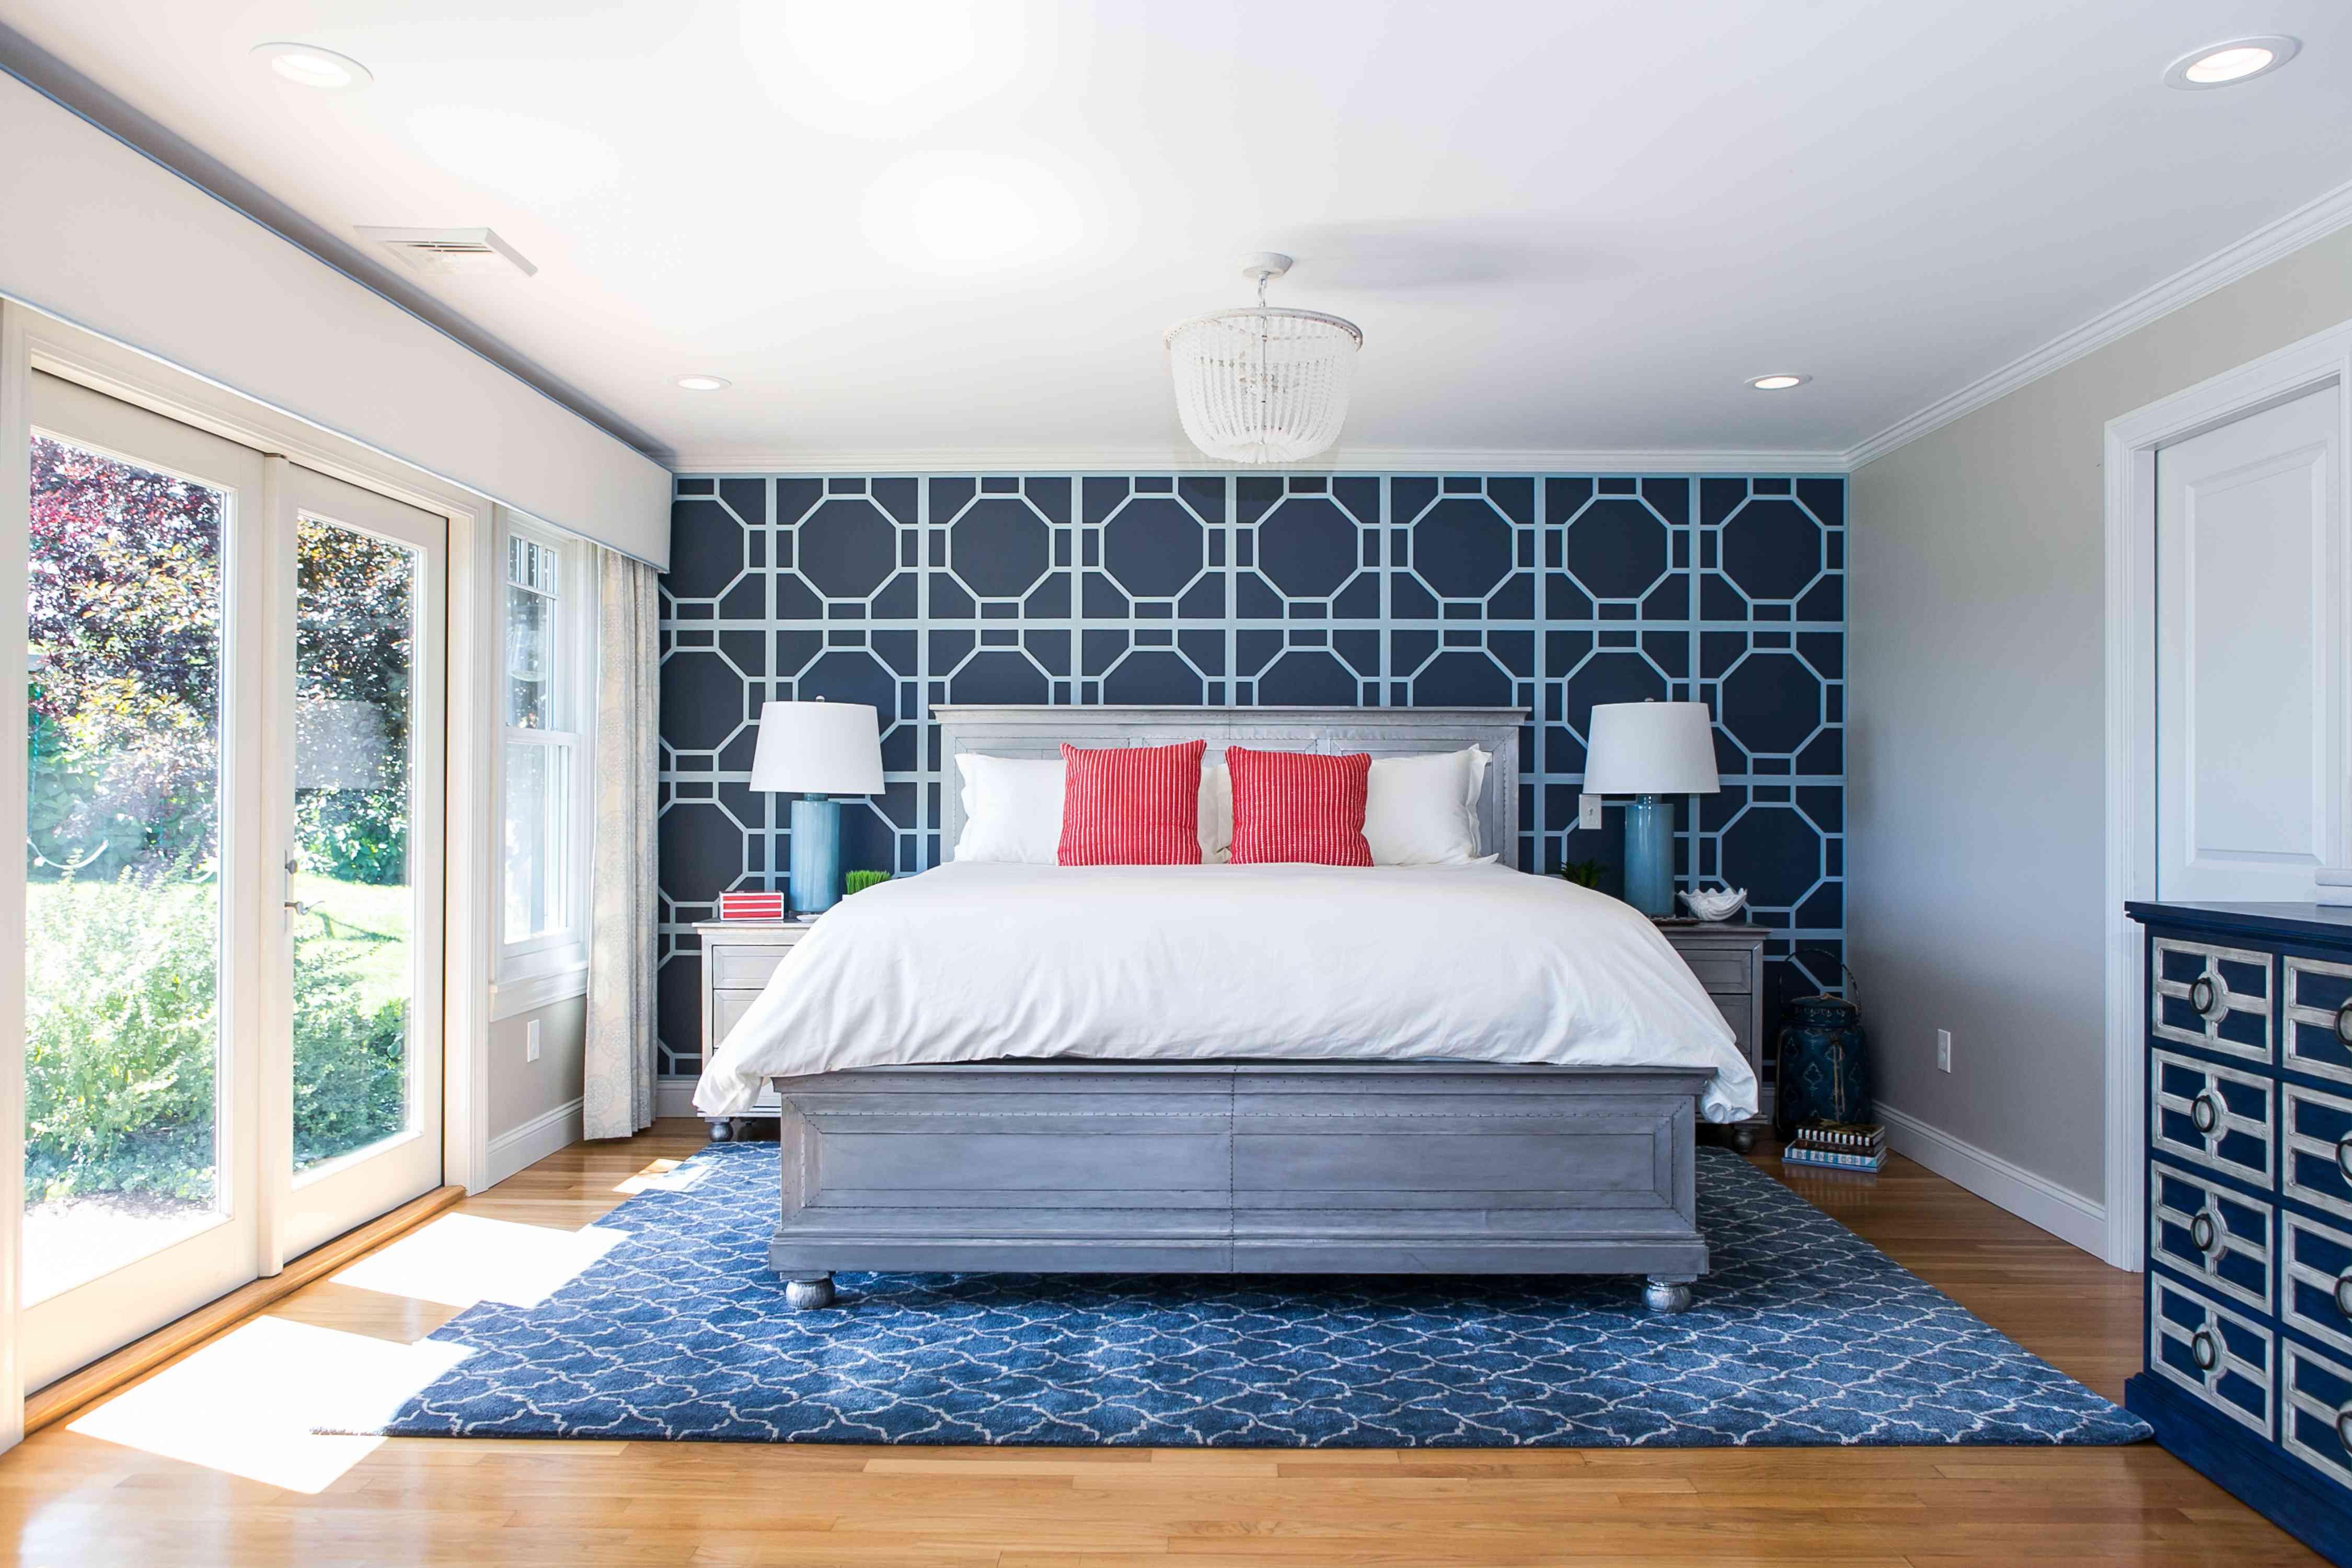 Modern blue-centered bedroom